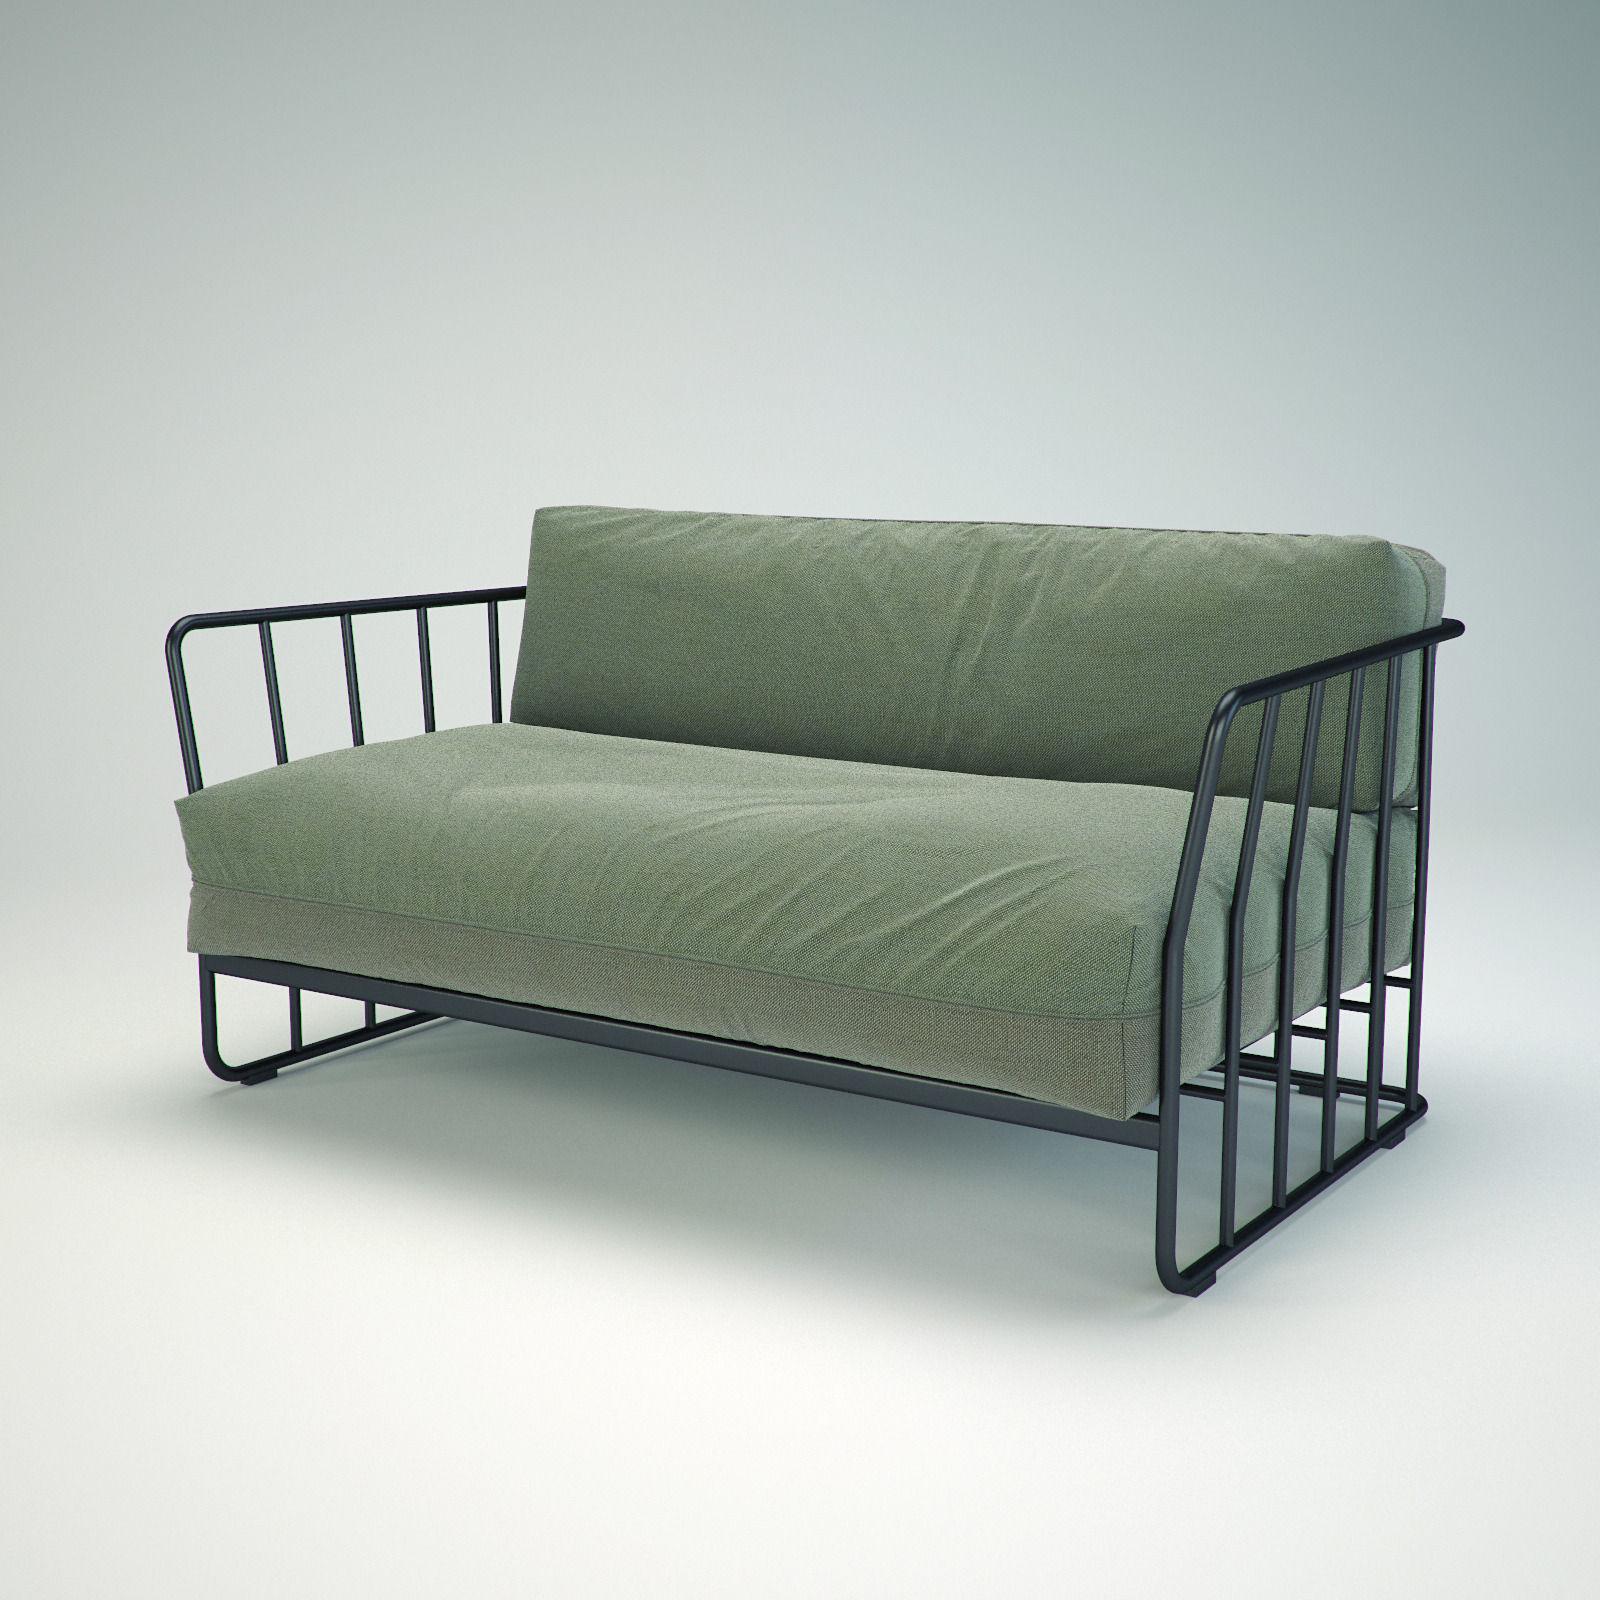 Bla Station Code 27 sofa set 3D model